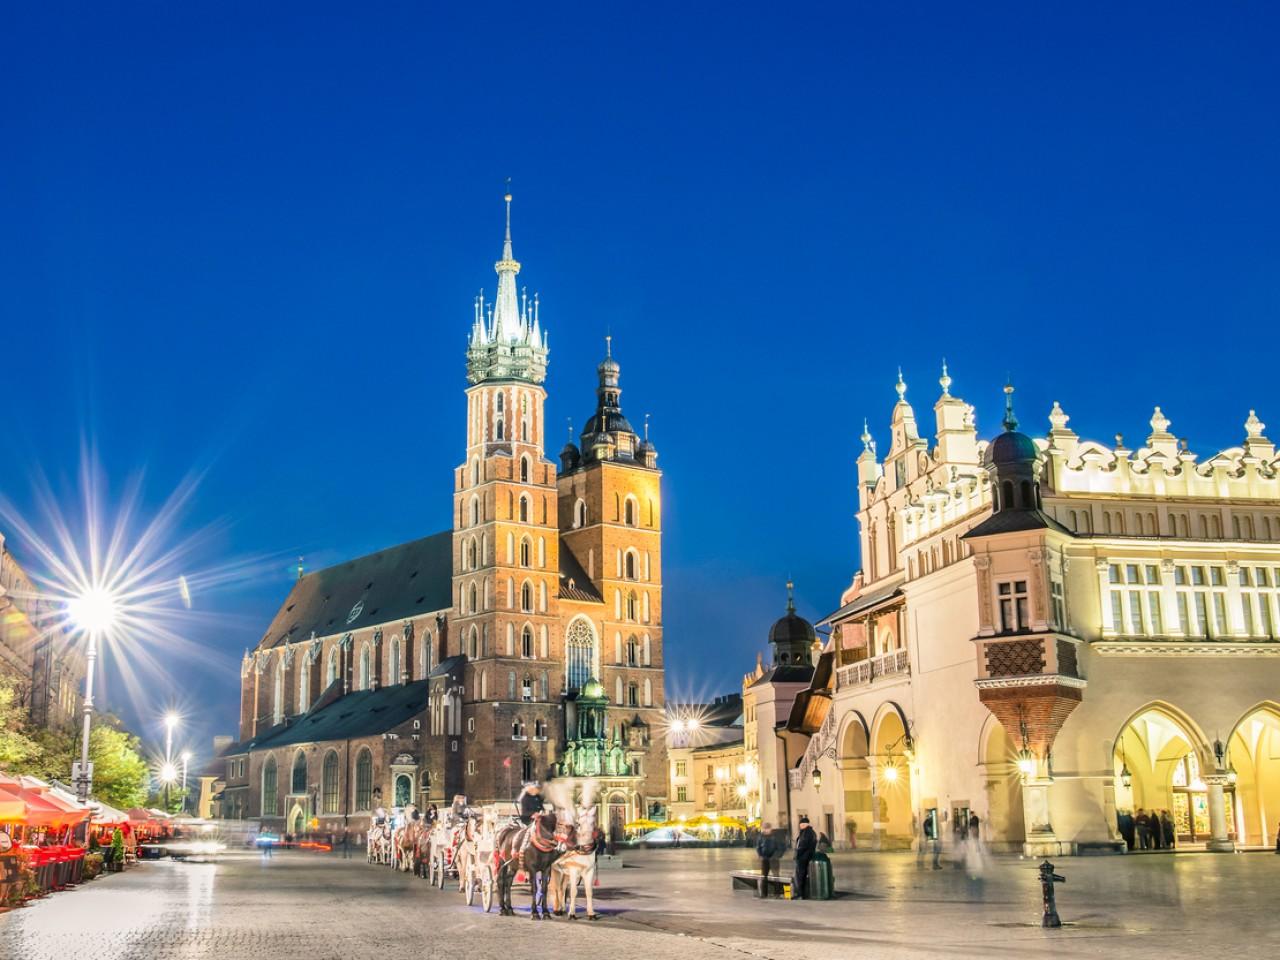 Krakow Music Festival for Choirs & Orchestras